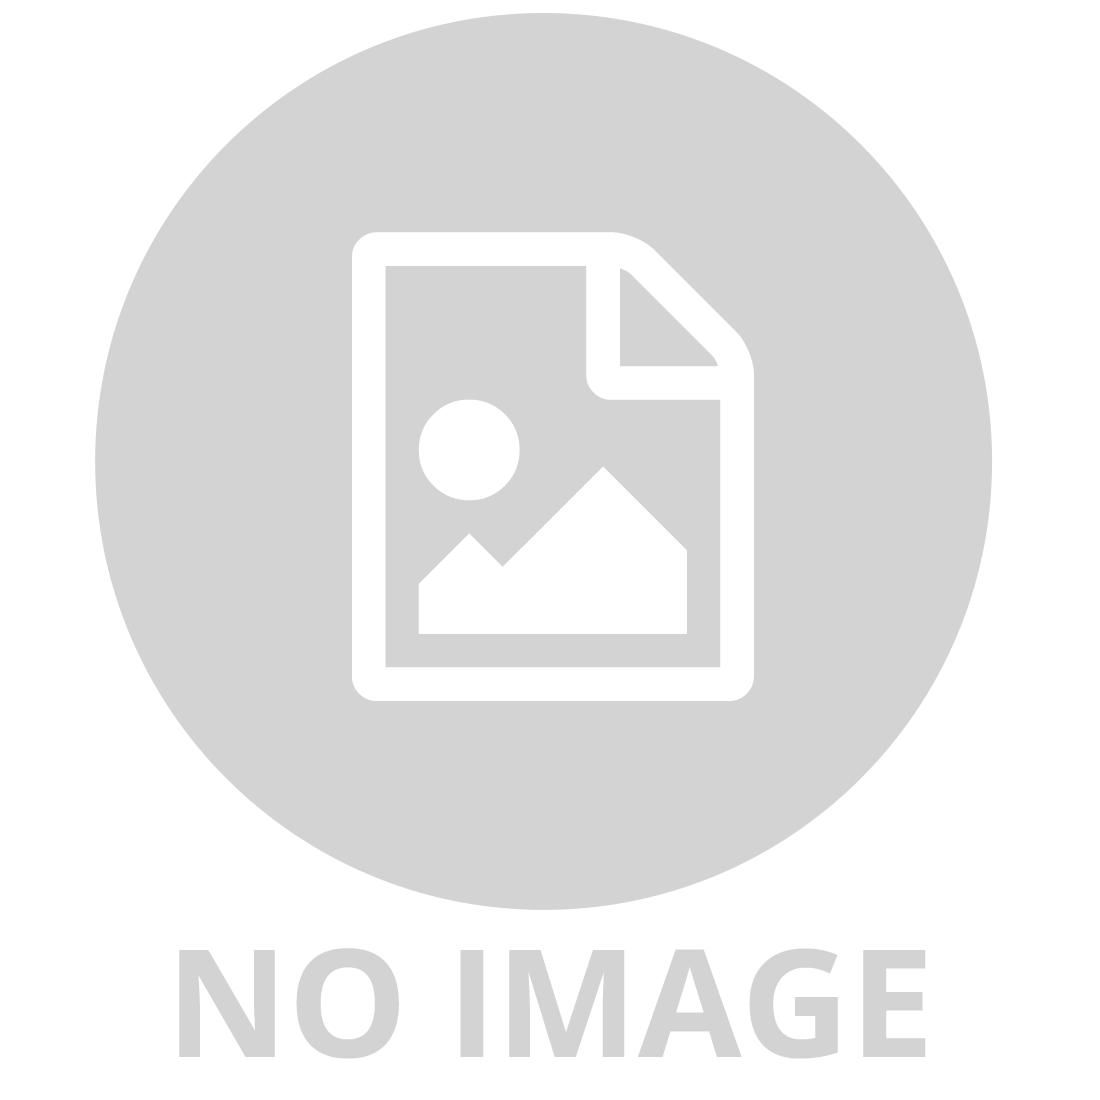 LEGO DISNEY PRINCESS 43187 RAPUNZEL'S TOWER